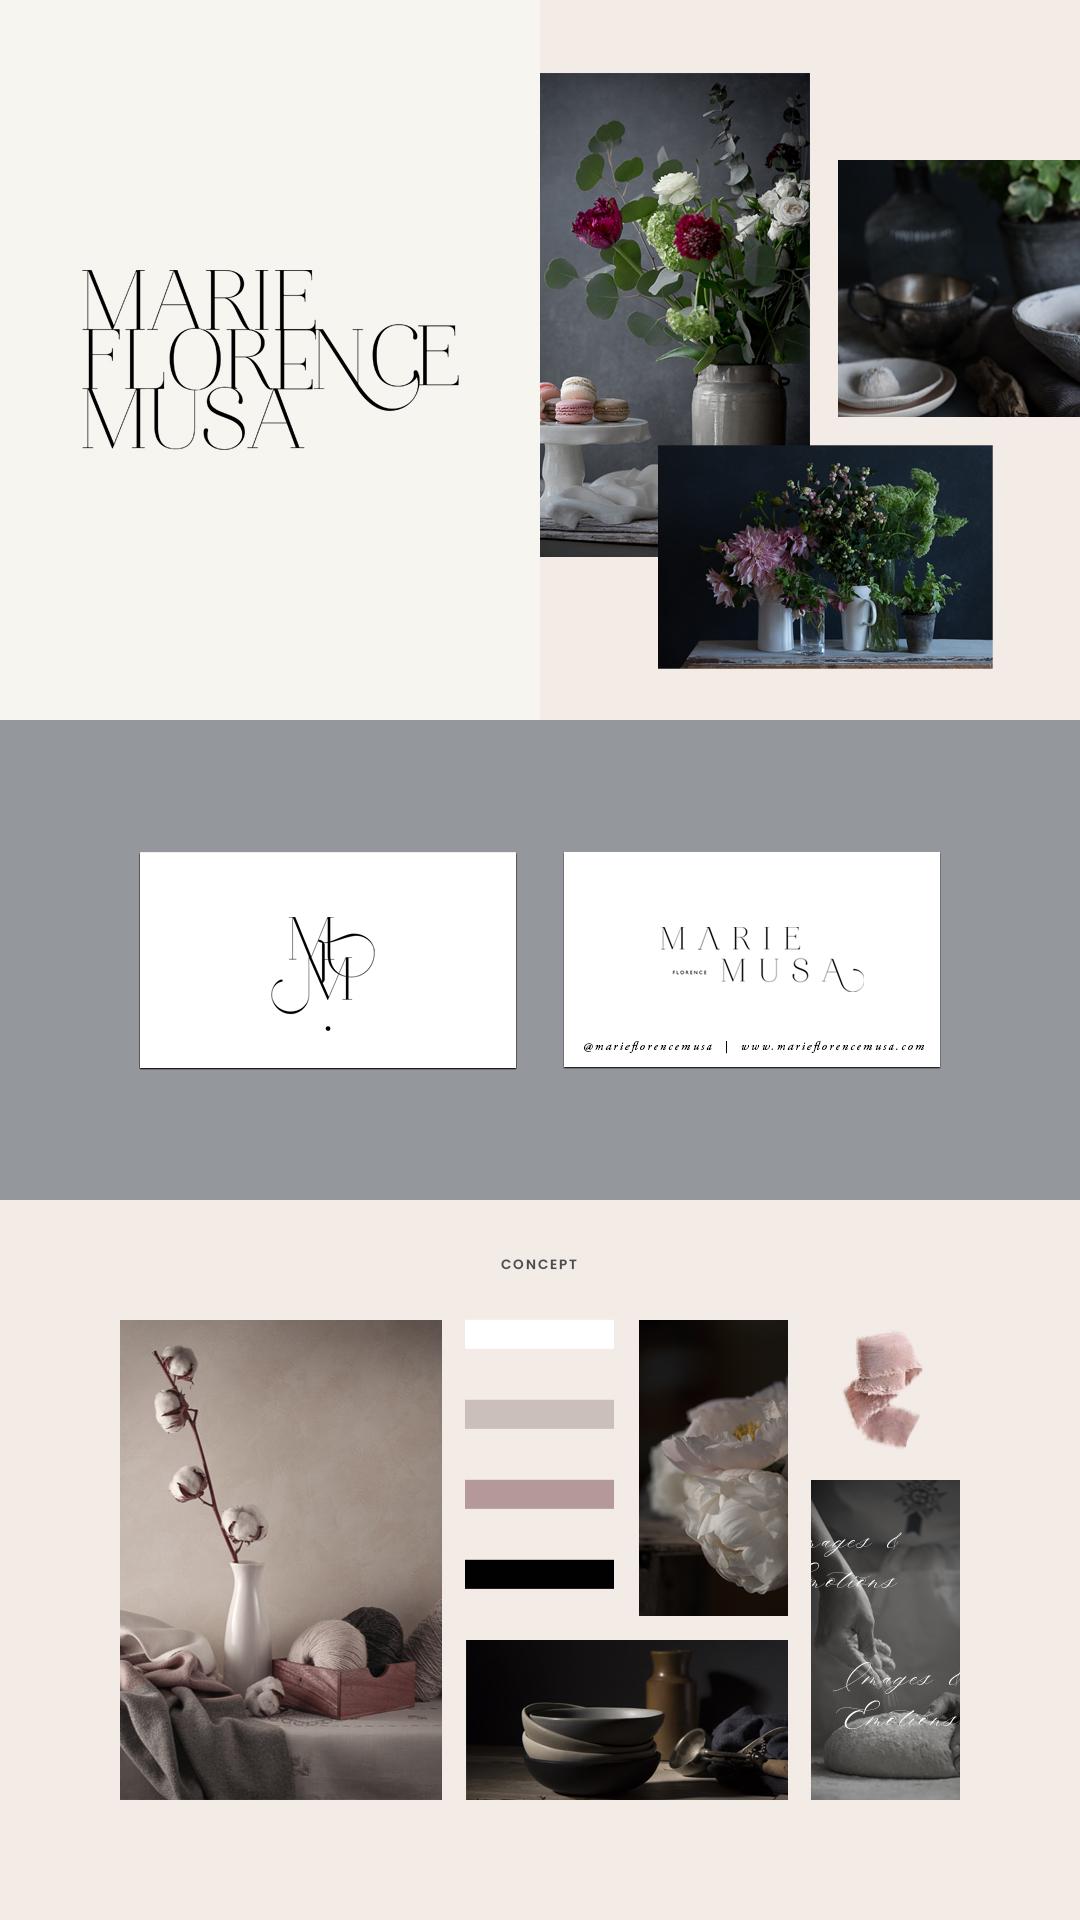 MFM-Concept-2.jpg